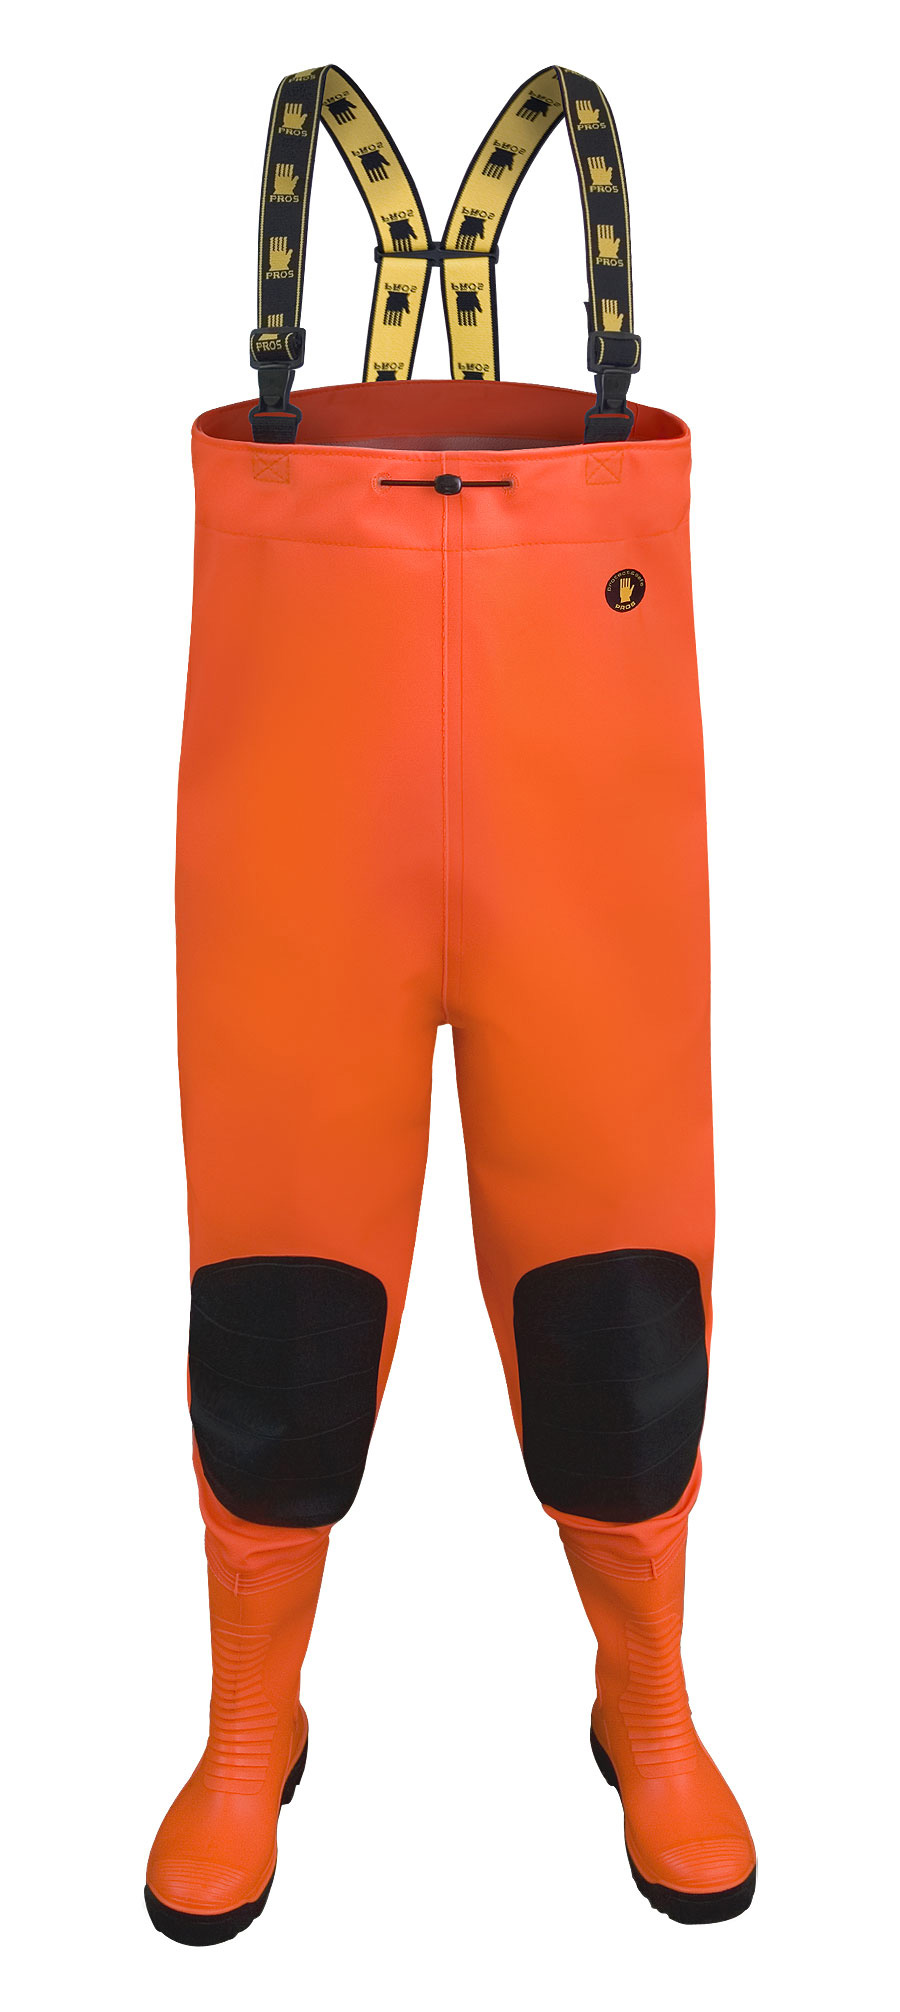 Brodící kalhoty MAX Fluo oranž vel.43    SBM01 Fluo or.   PROS